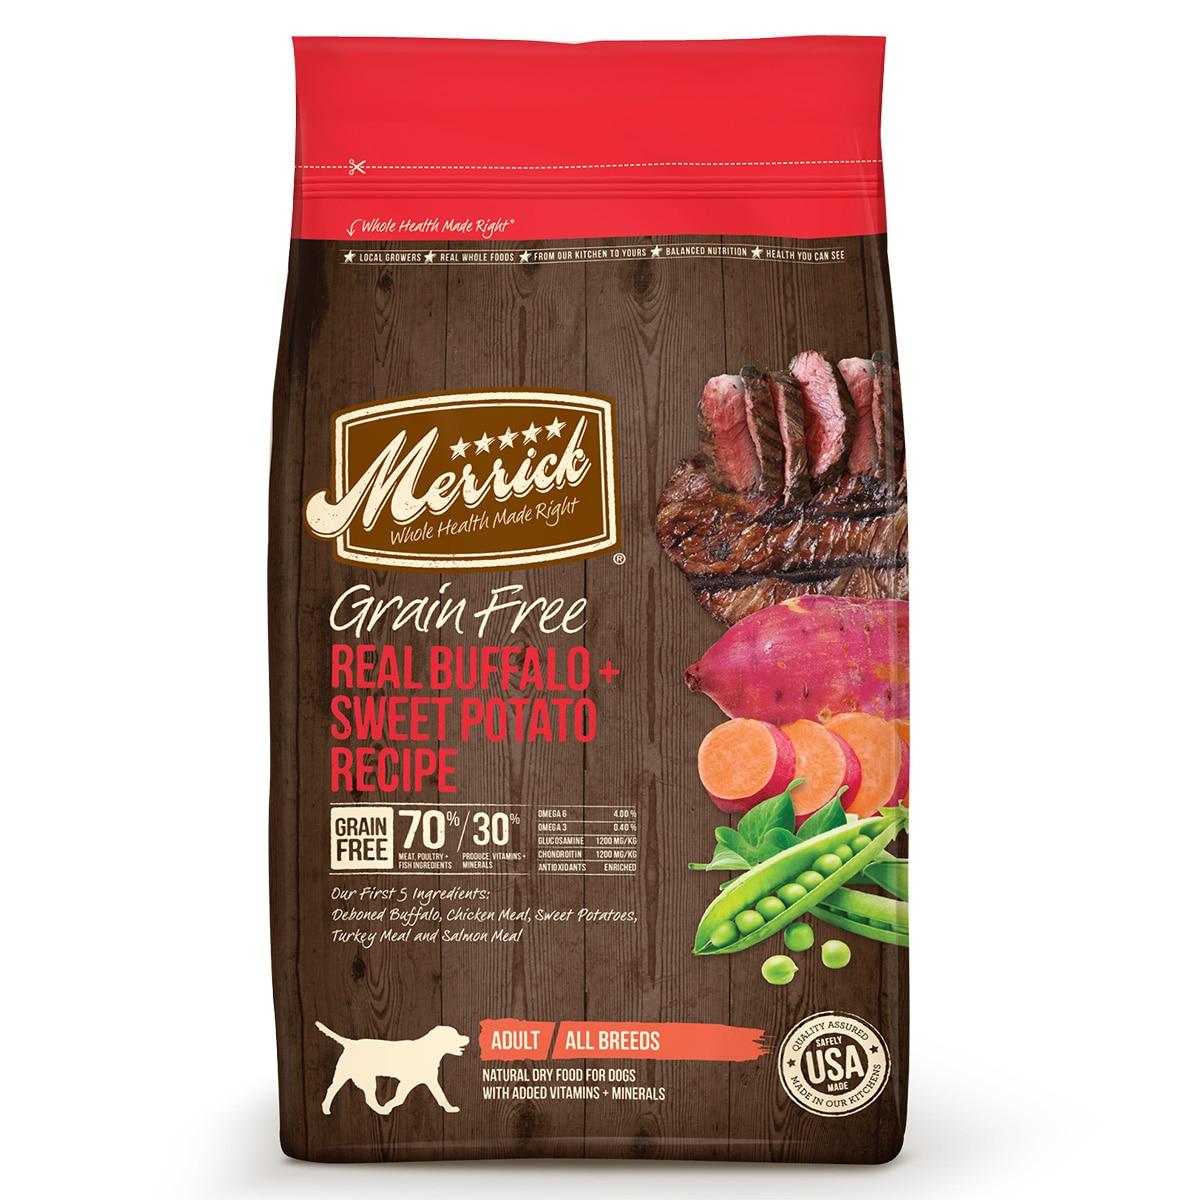 Merrick® Grain Free Real Buffalo + Sweet Potato Recipe Dry Dog Food